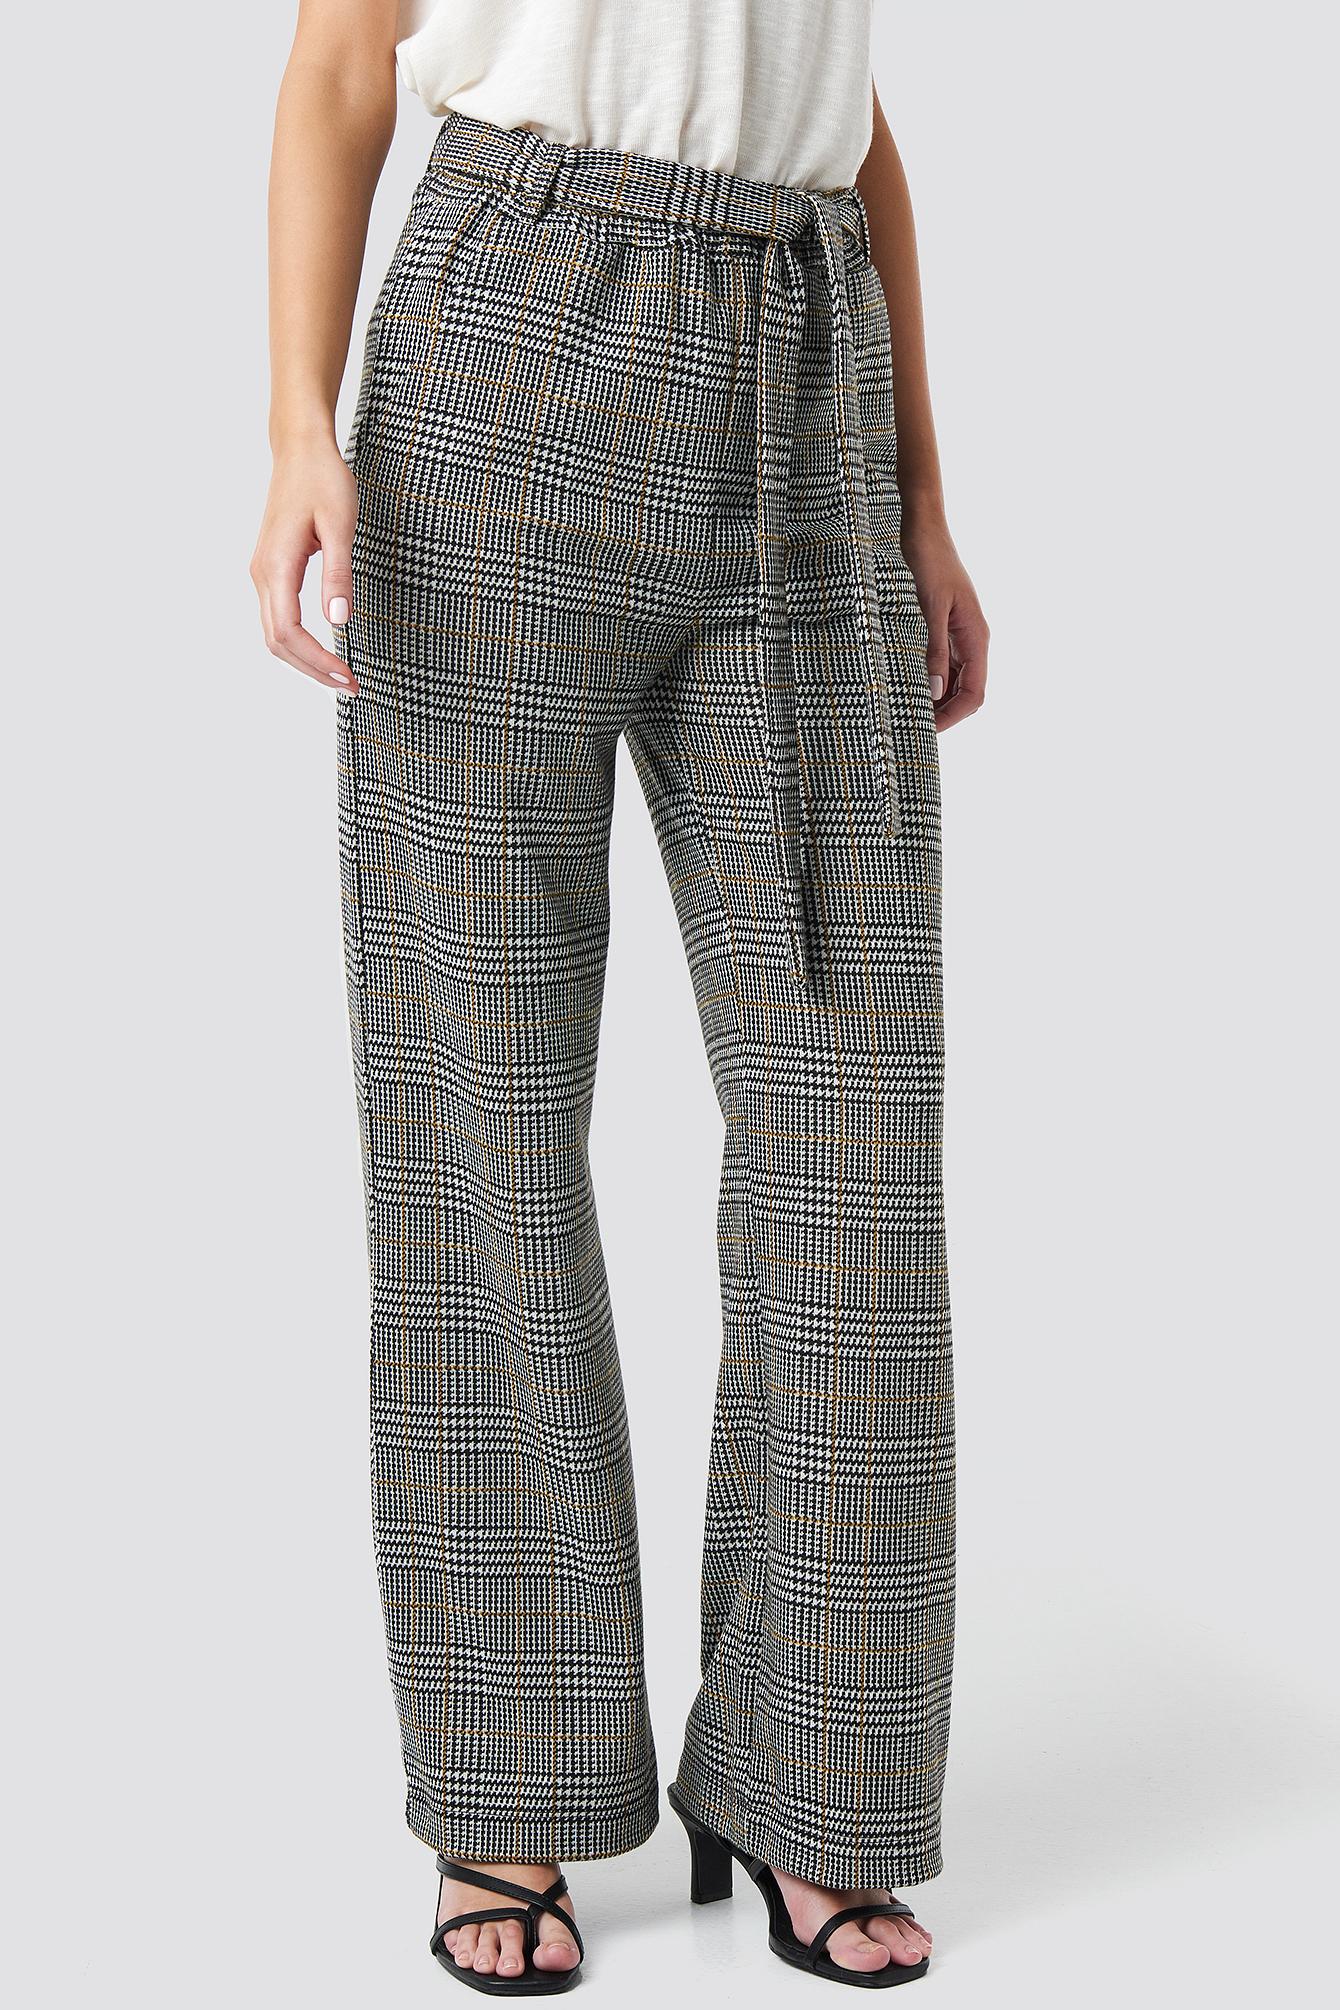 Jacquard Check Trousers NA-KD.COM